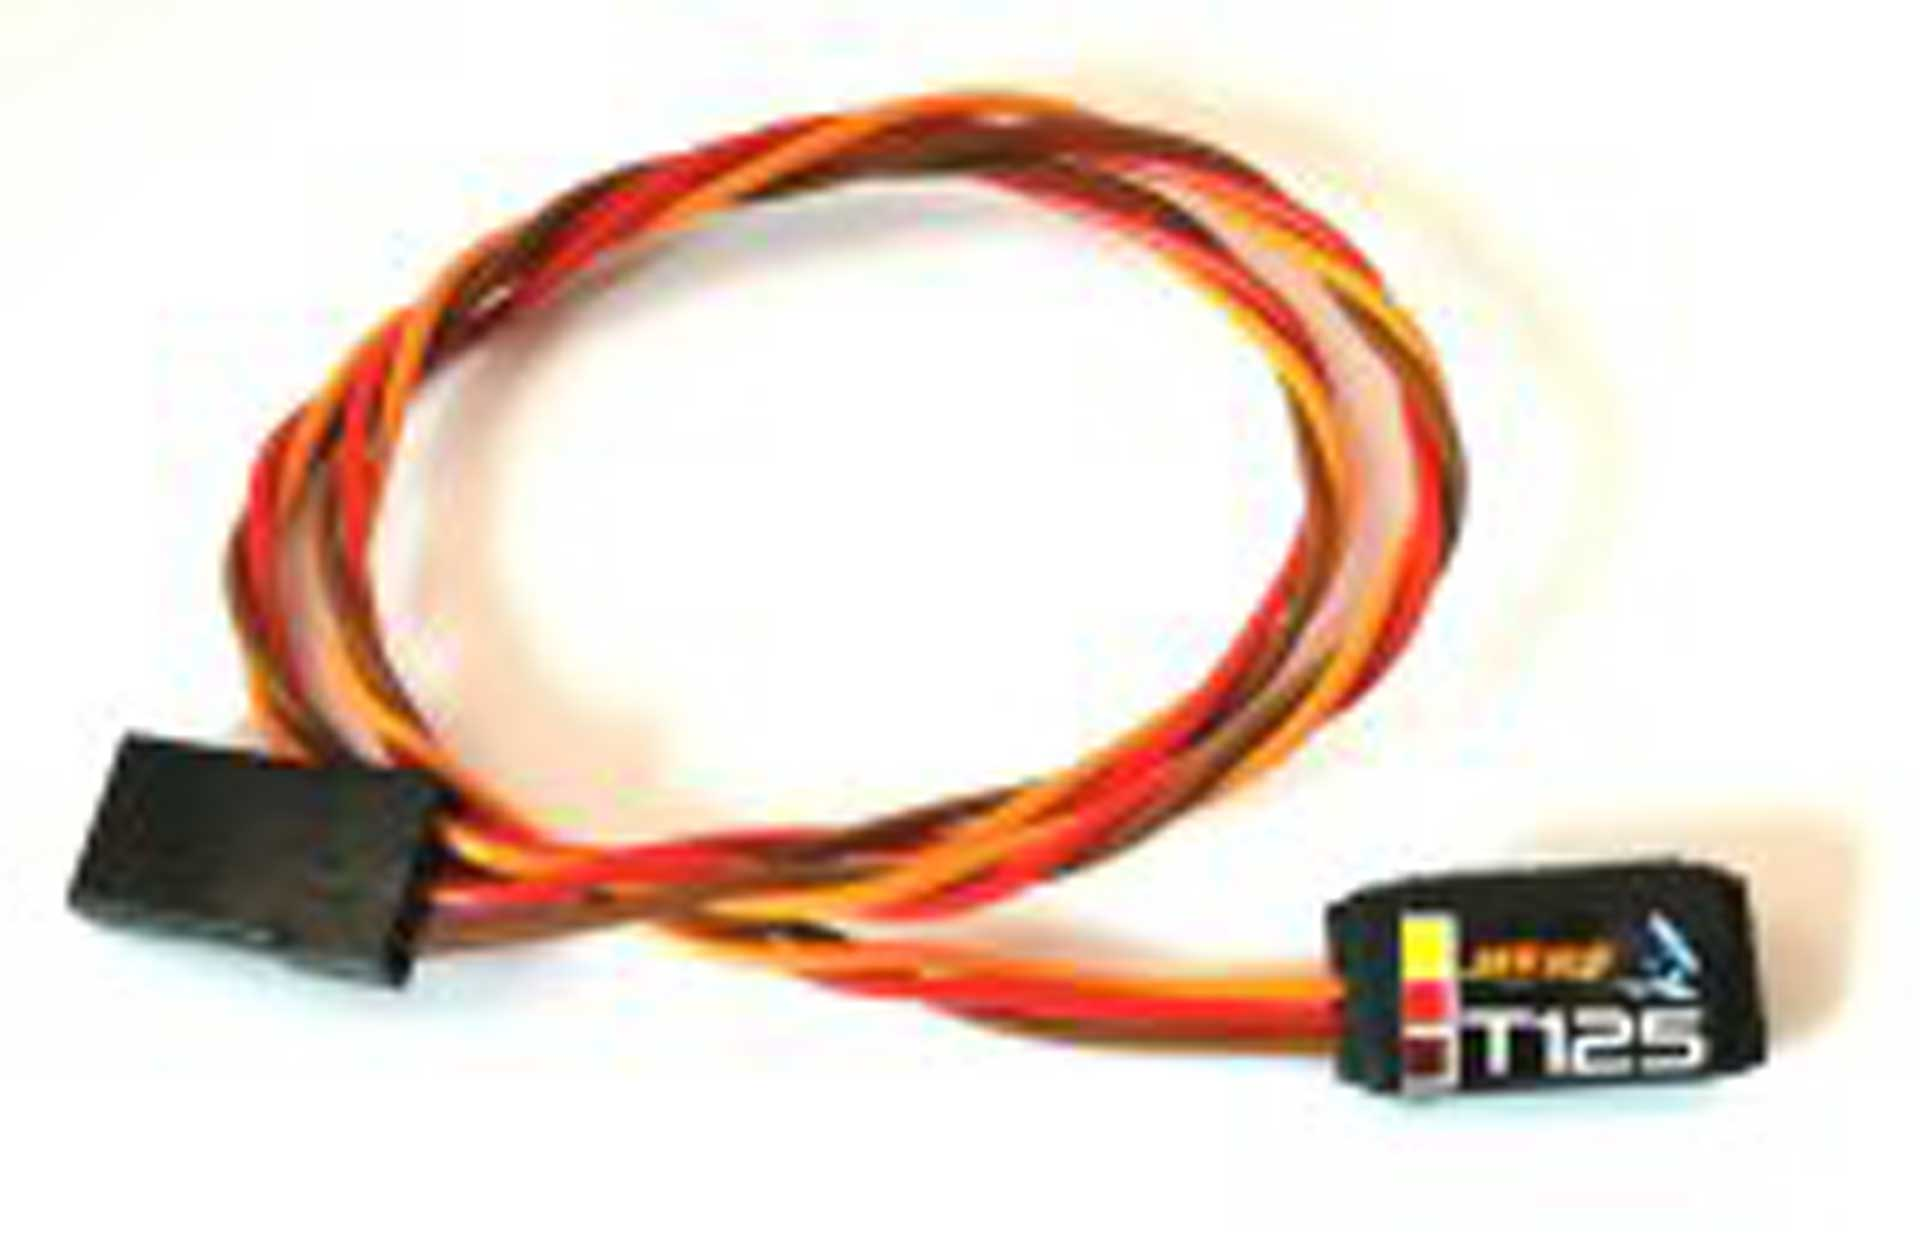 HEPF HT125 Temperatursensor mit Kabel